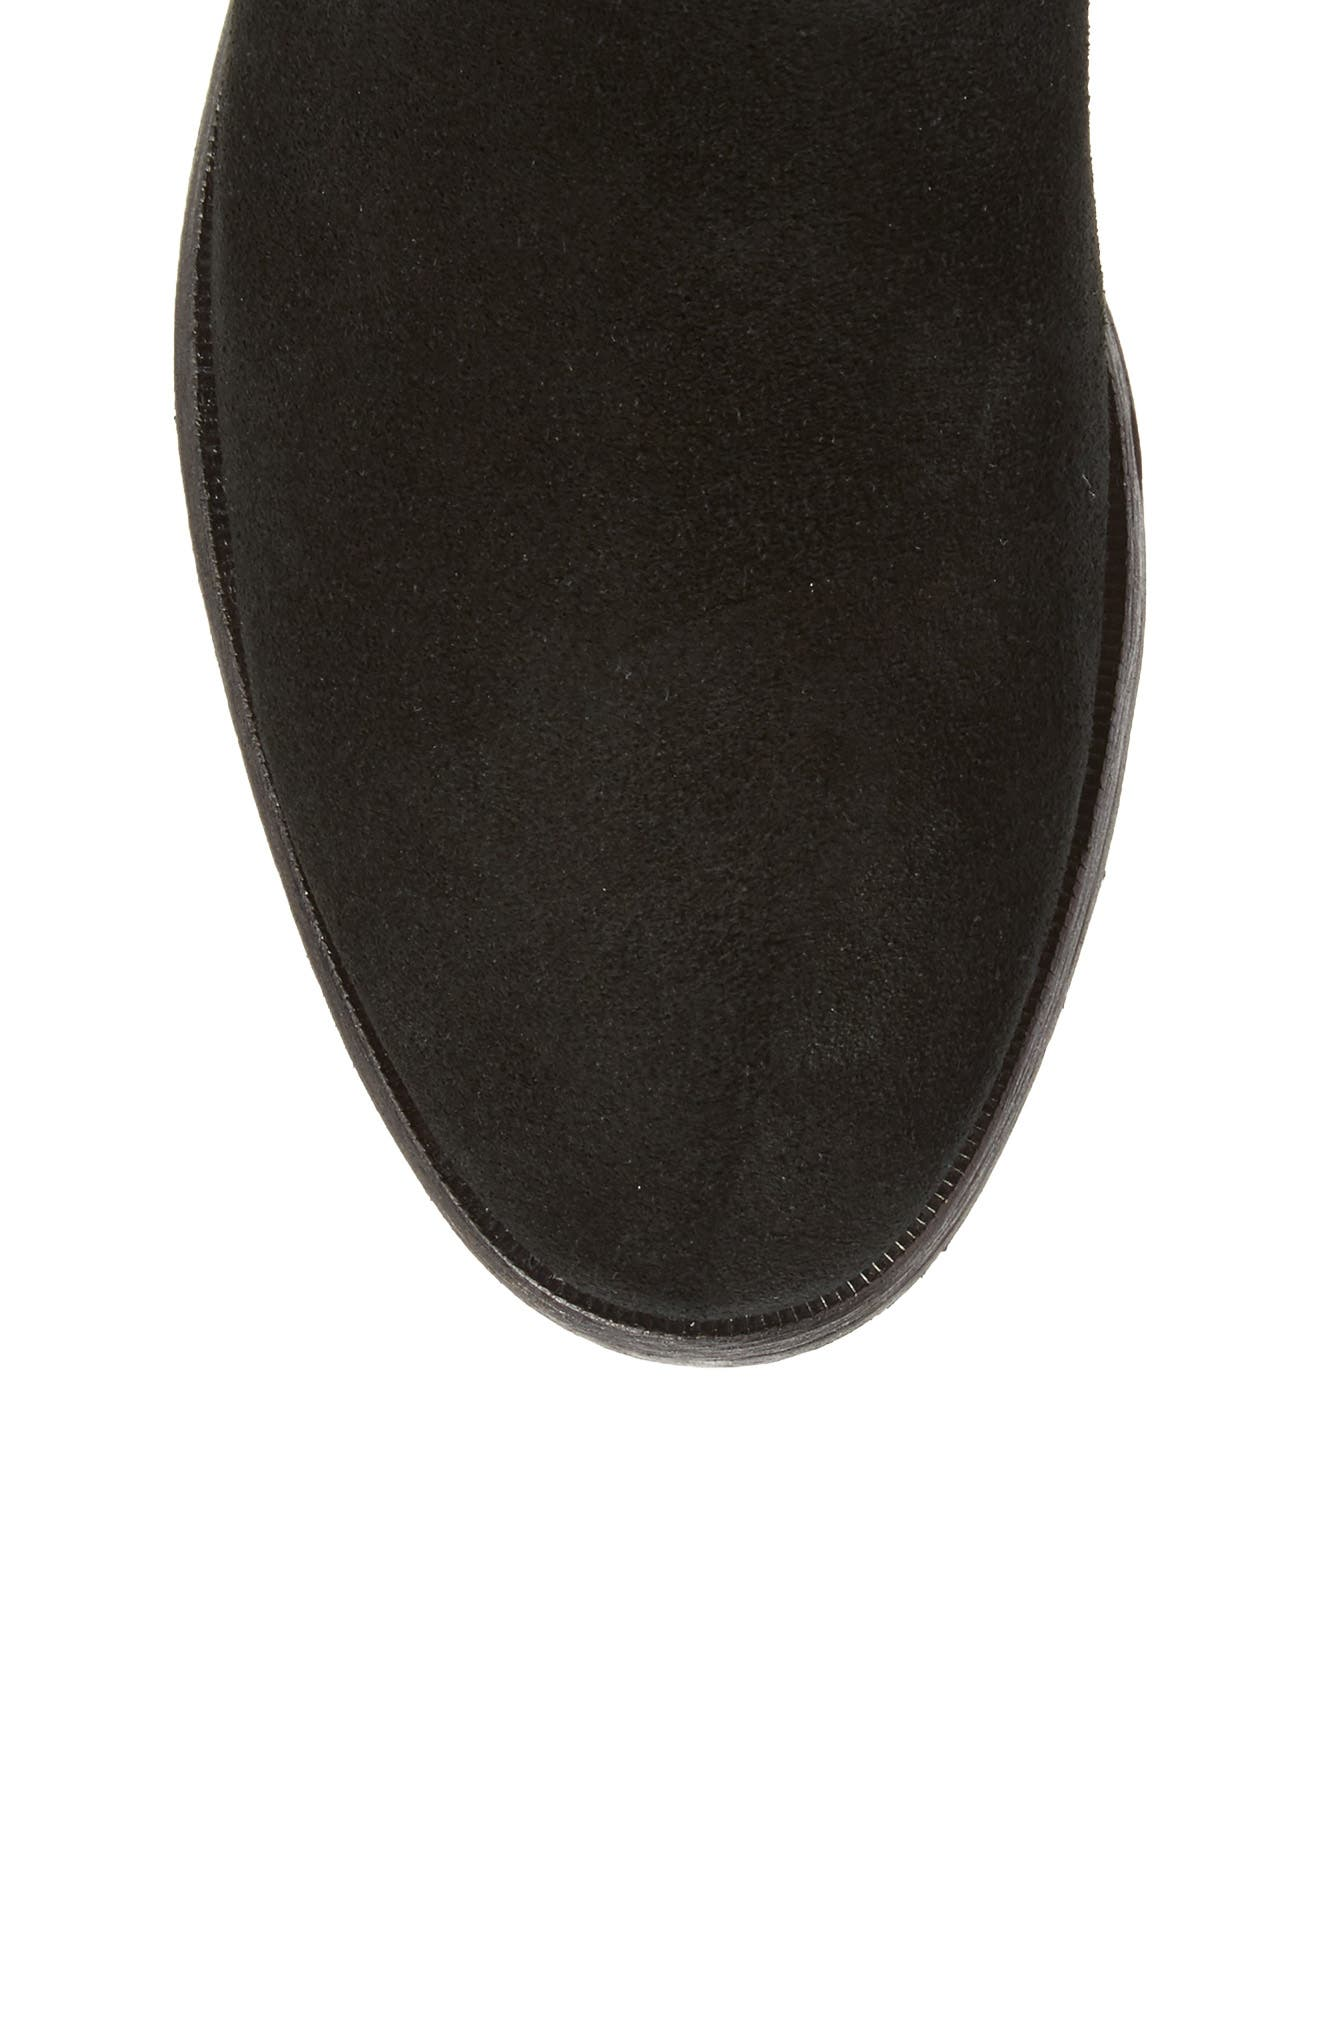 Gracen Knee High Boot,                             Alternate thumbnail 5, color,                             Black Suede